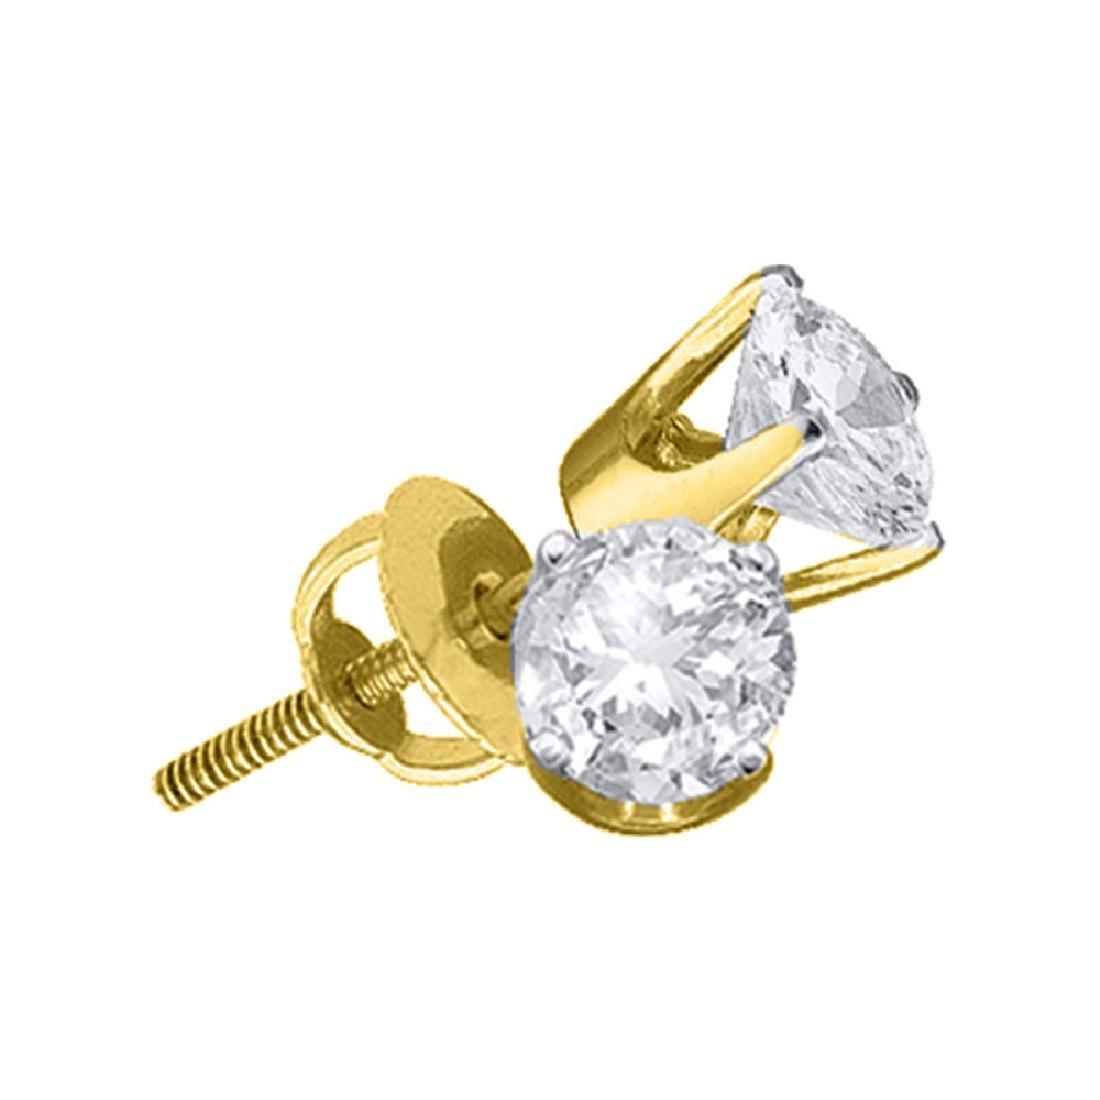 0.39 CTW Diamond Solitaire Stud Earrings 14KT Yellow